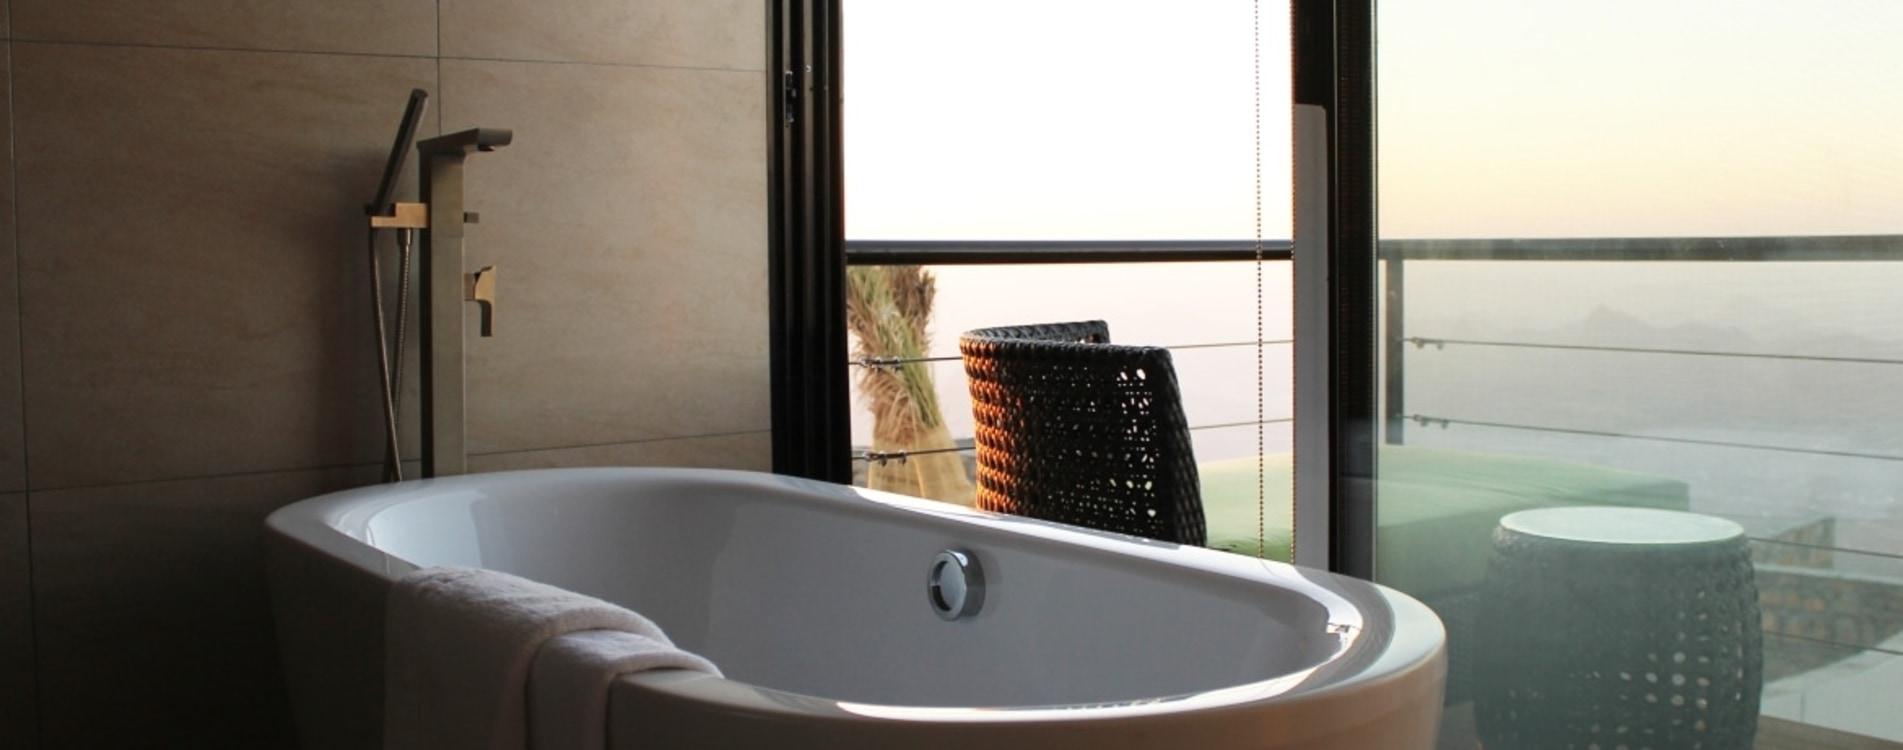 The-View-Oman-Superior-Room-Badezimmer-Badewanne.jpg